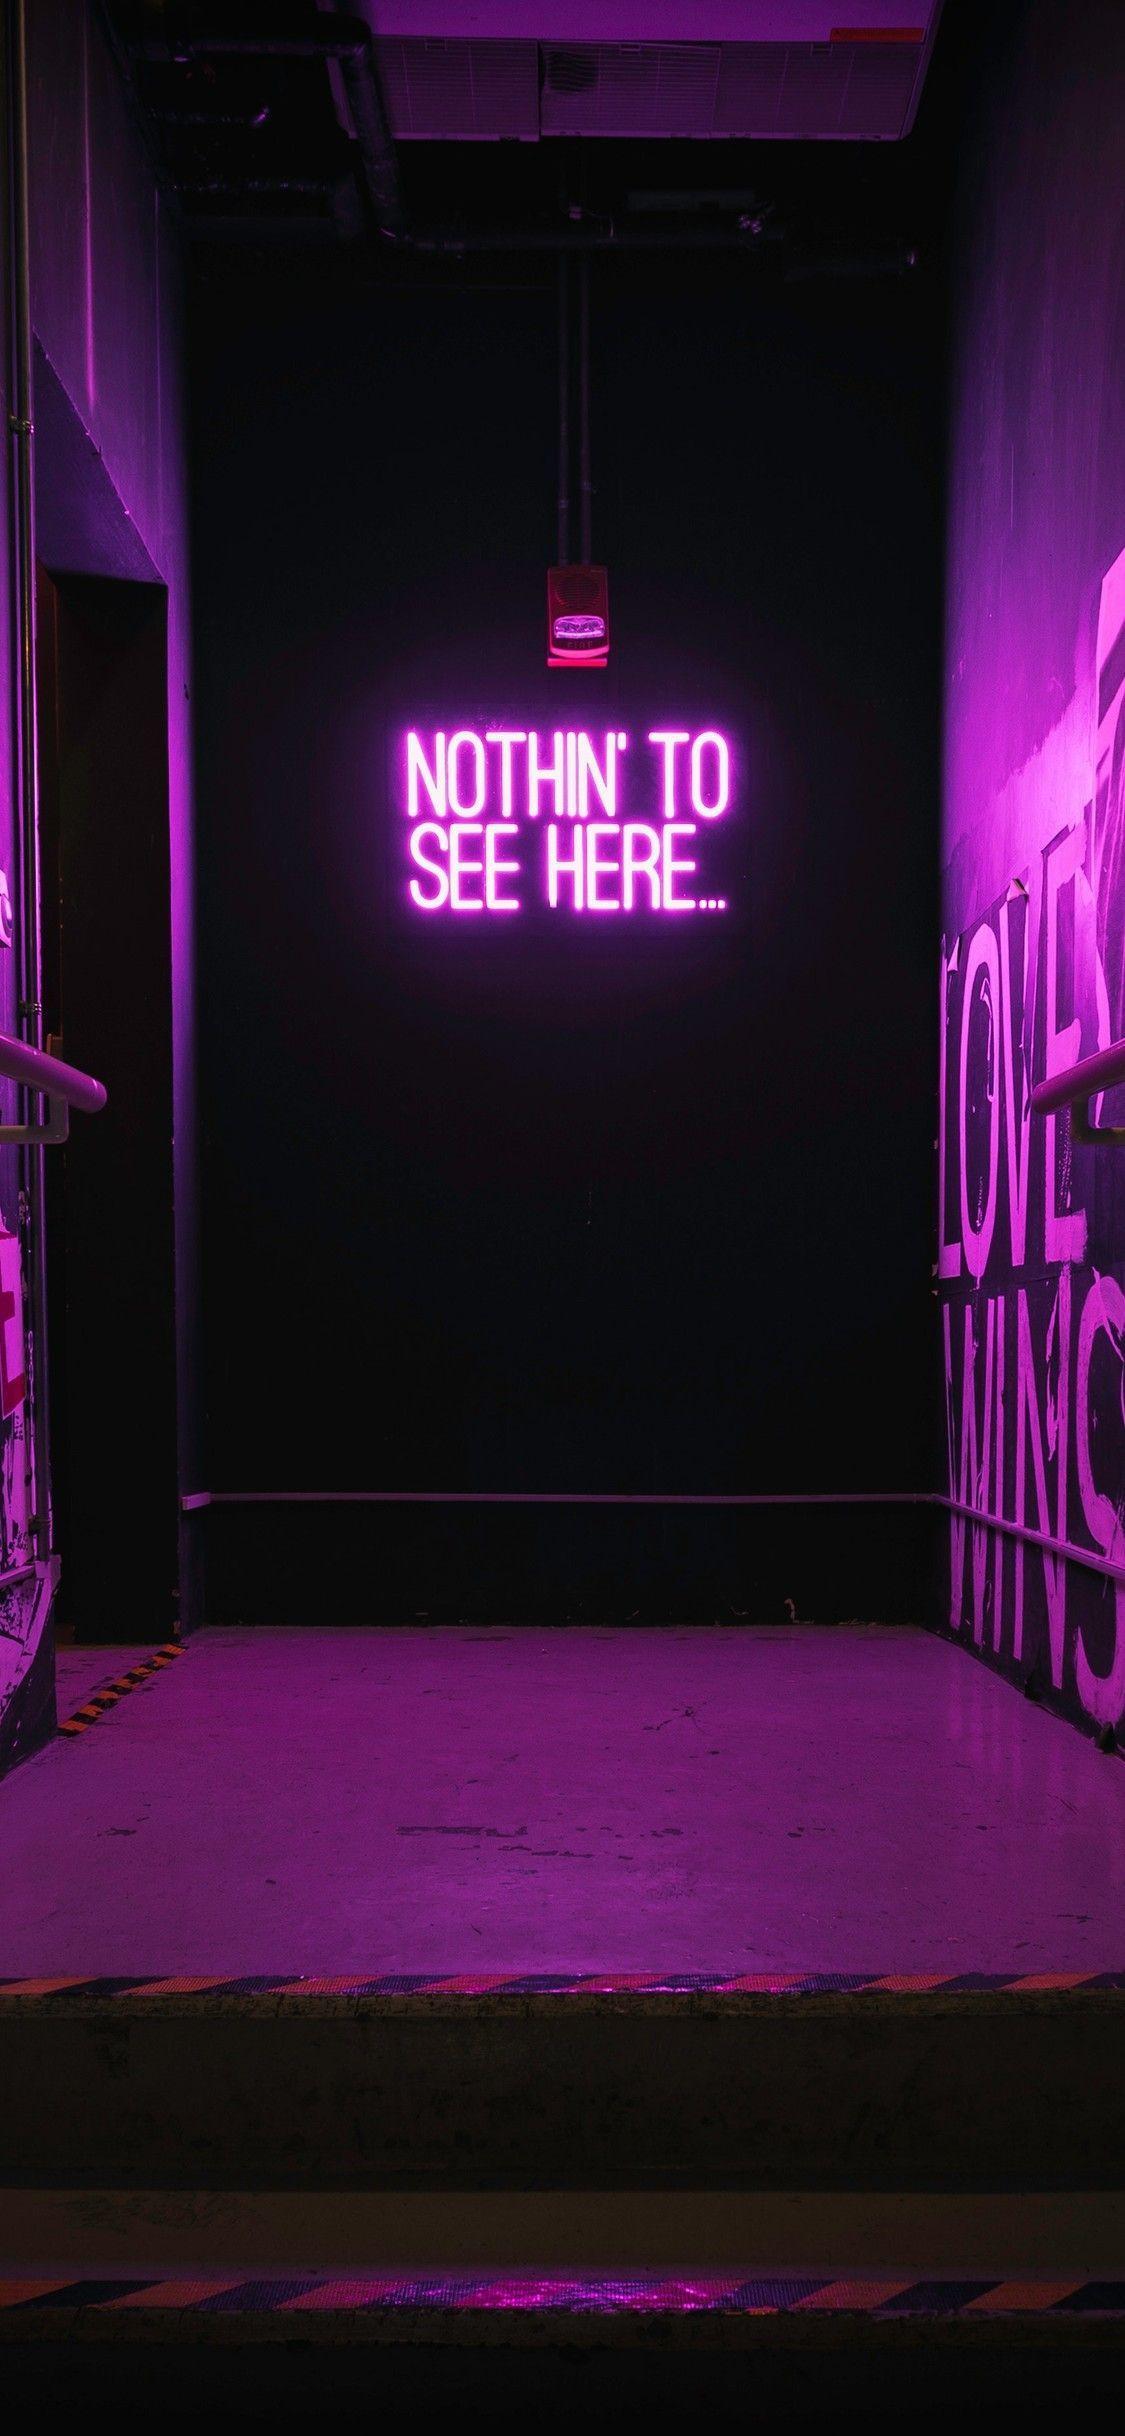 Aesthetic Neon Iphone Wallpapers Wallpaper Cave